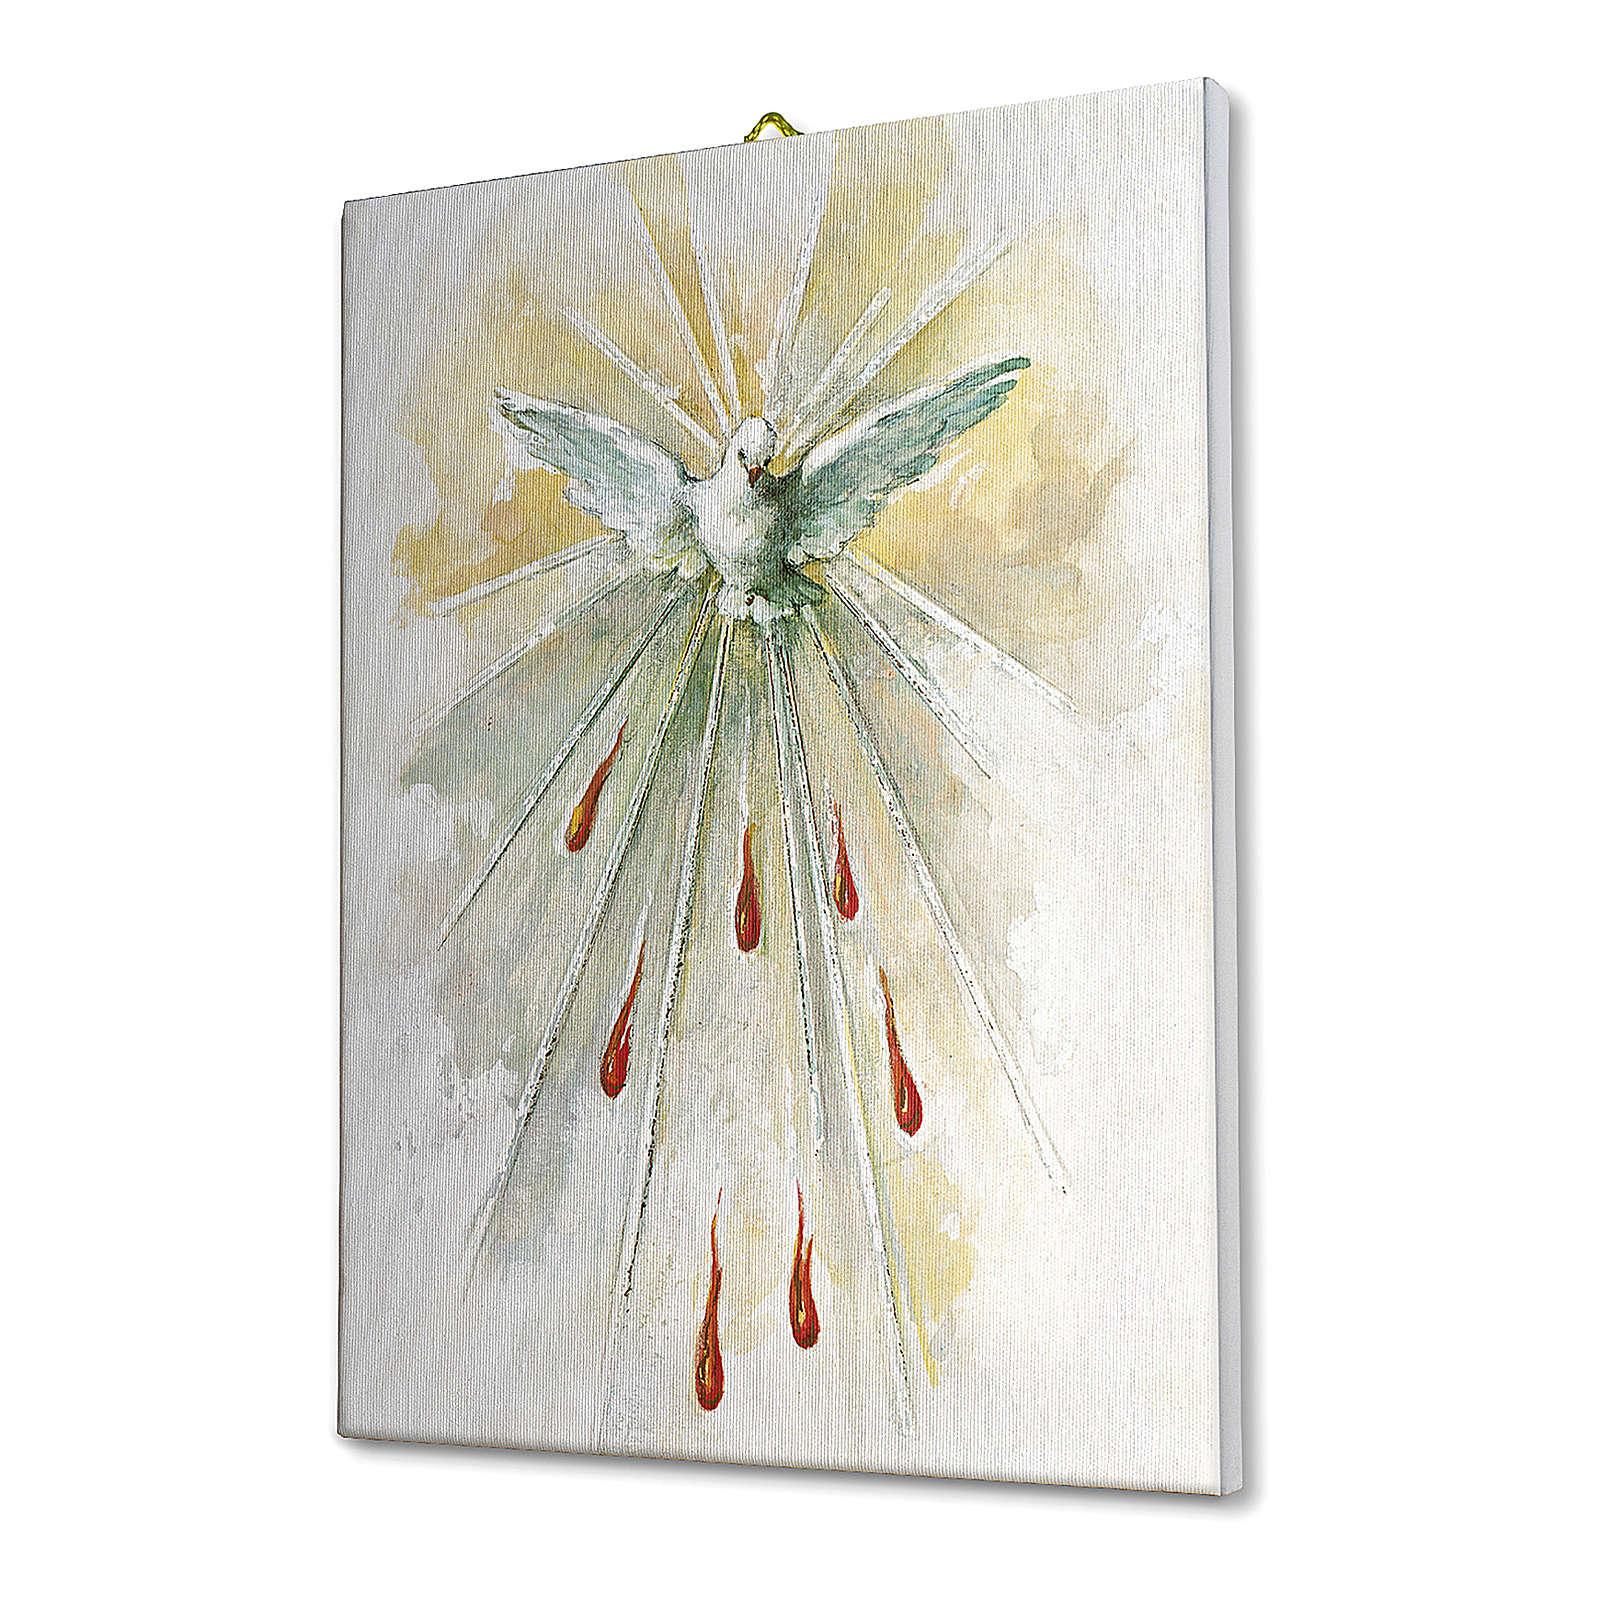 Cuadro sobre tela pictórica Espíritu Santo 25x20 cm 3